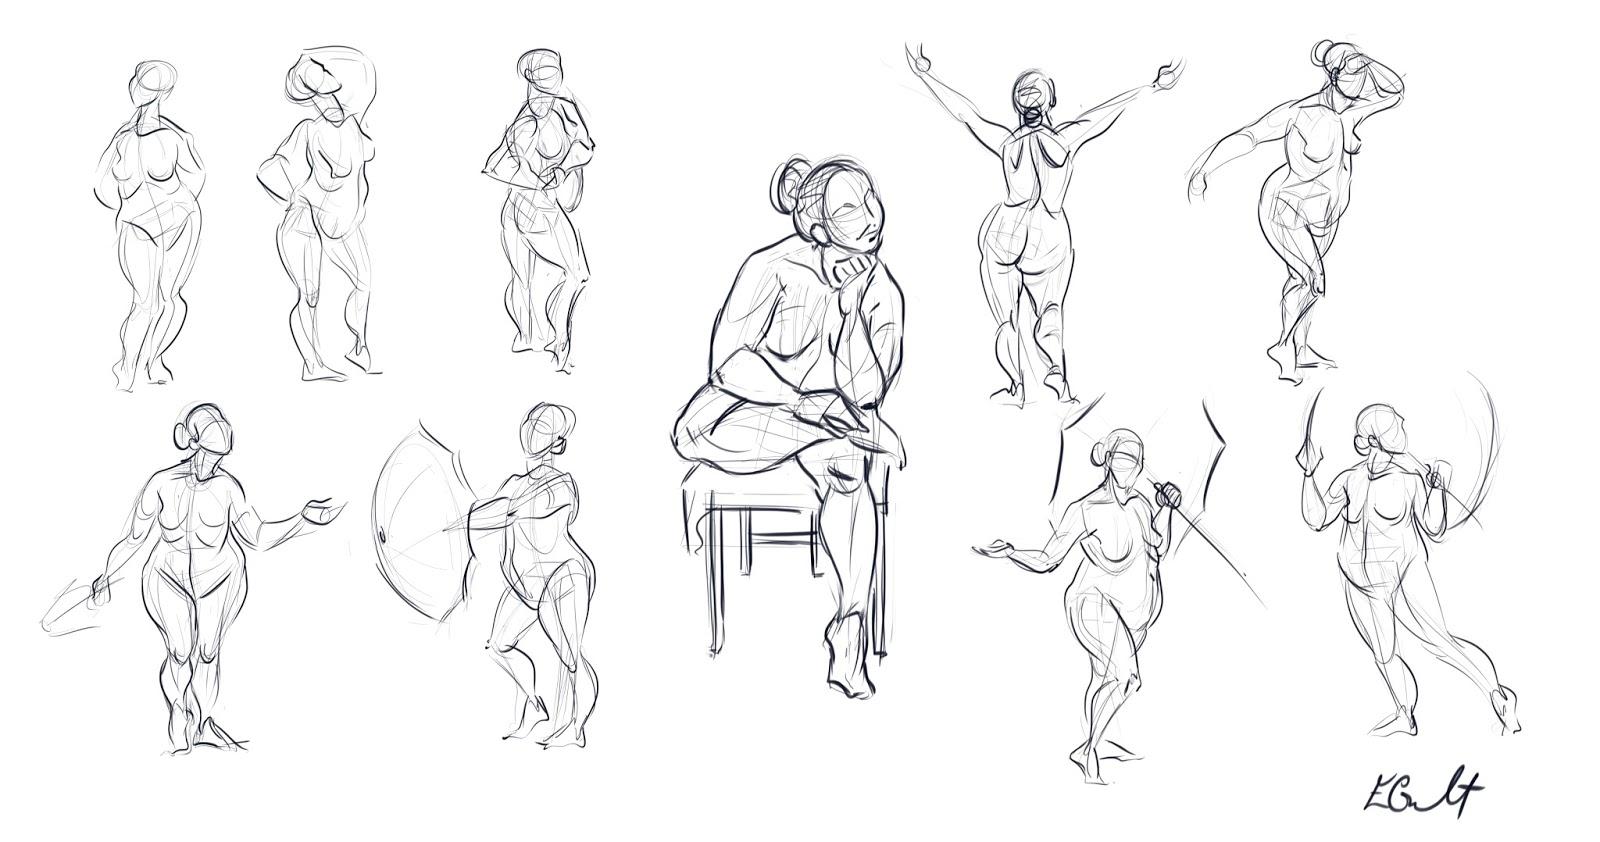 1600x842 Emilie Goulet, Cg Animator